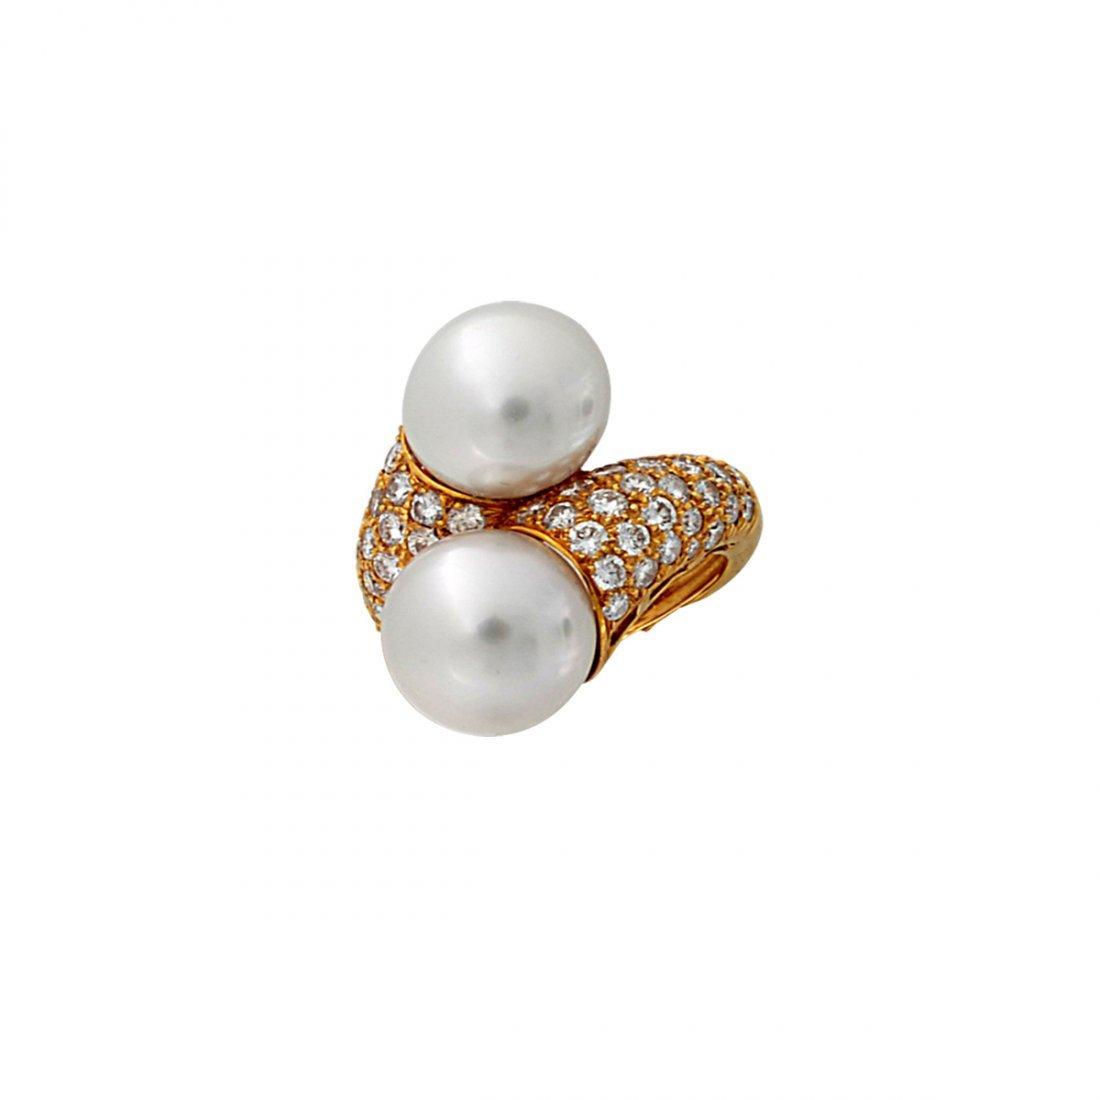 4: South Sea pearls measuring 11/12mm in diameter surro